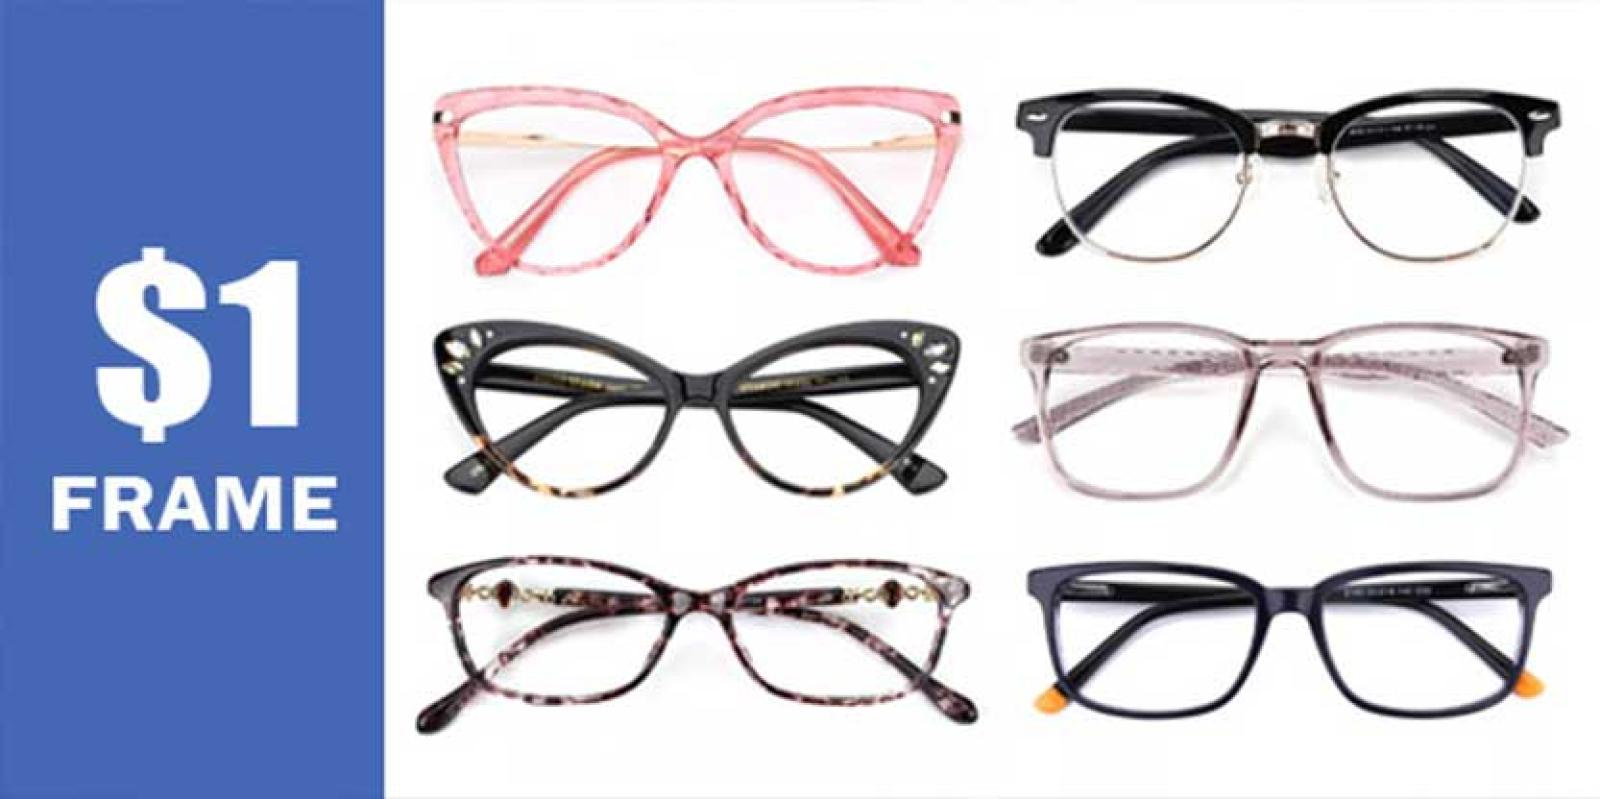 1.50 Standard Index Flat Top Bifocal With Line-Translucent---Eyeglasses-additional3